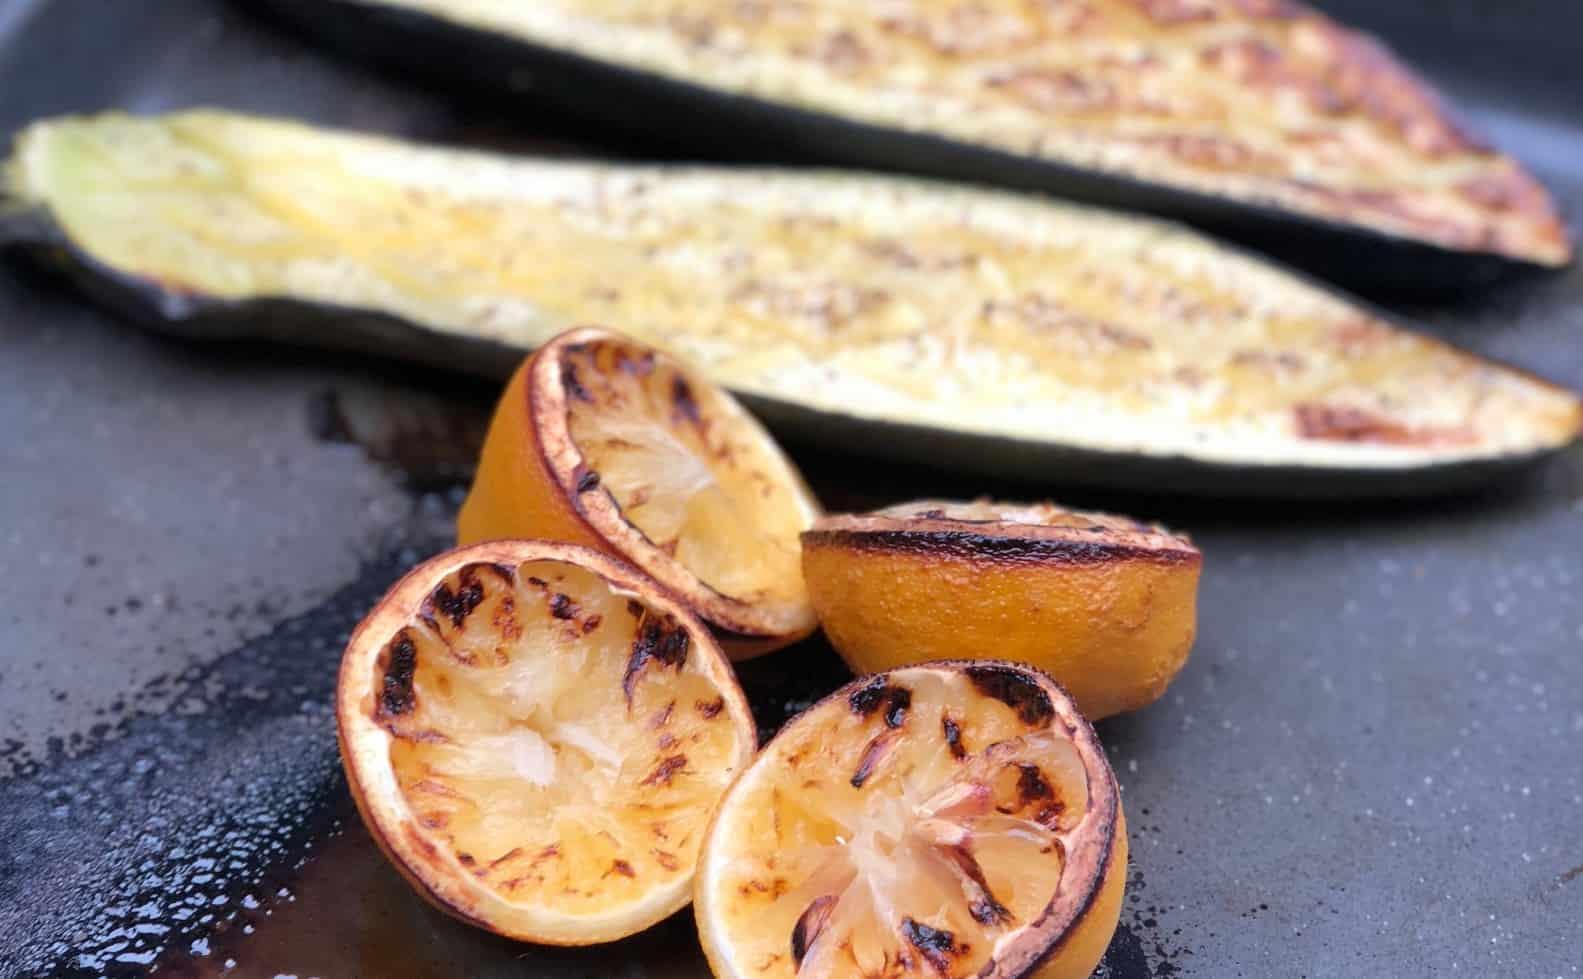 Grillad citron och zucchini ur Matkomforts matkasse